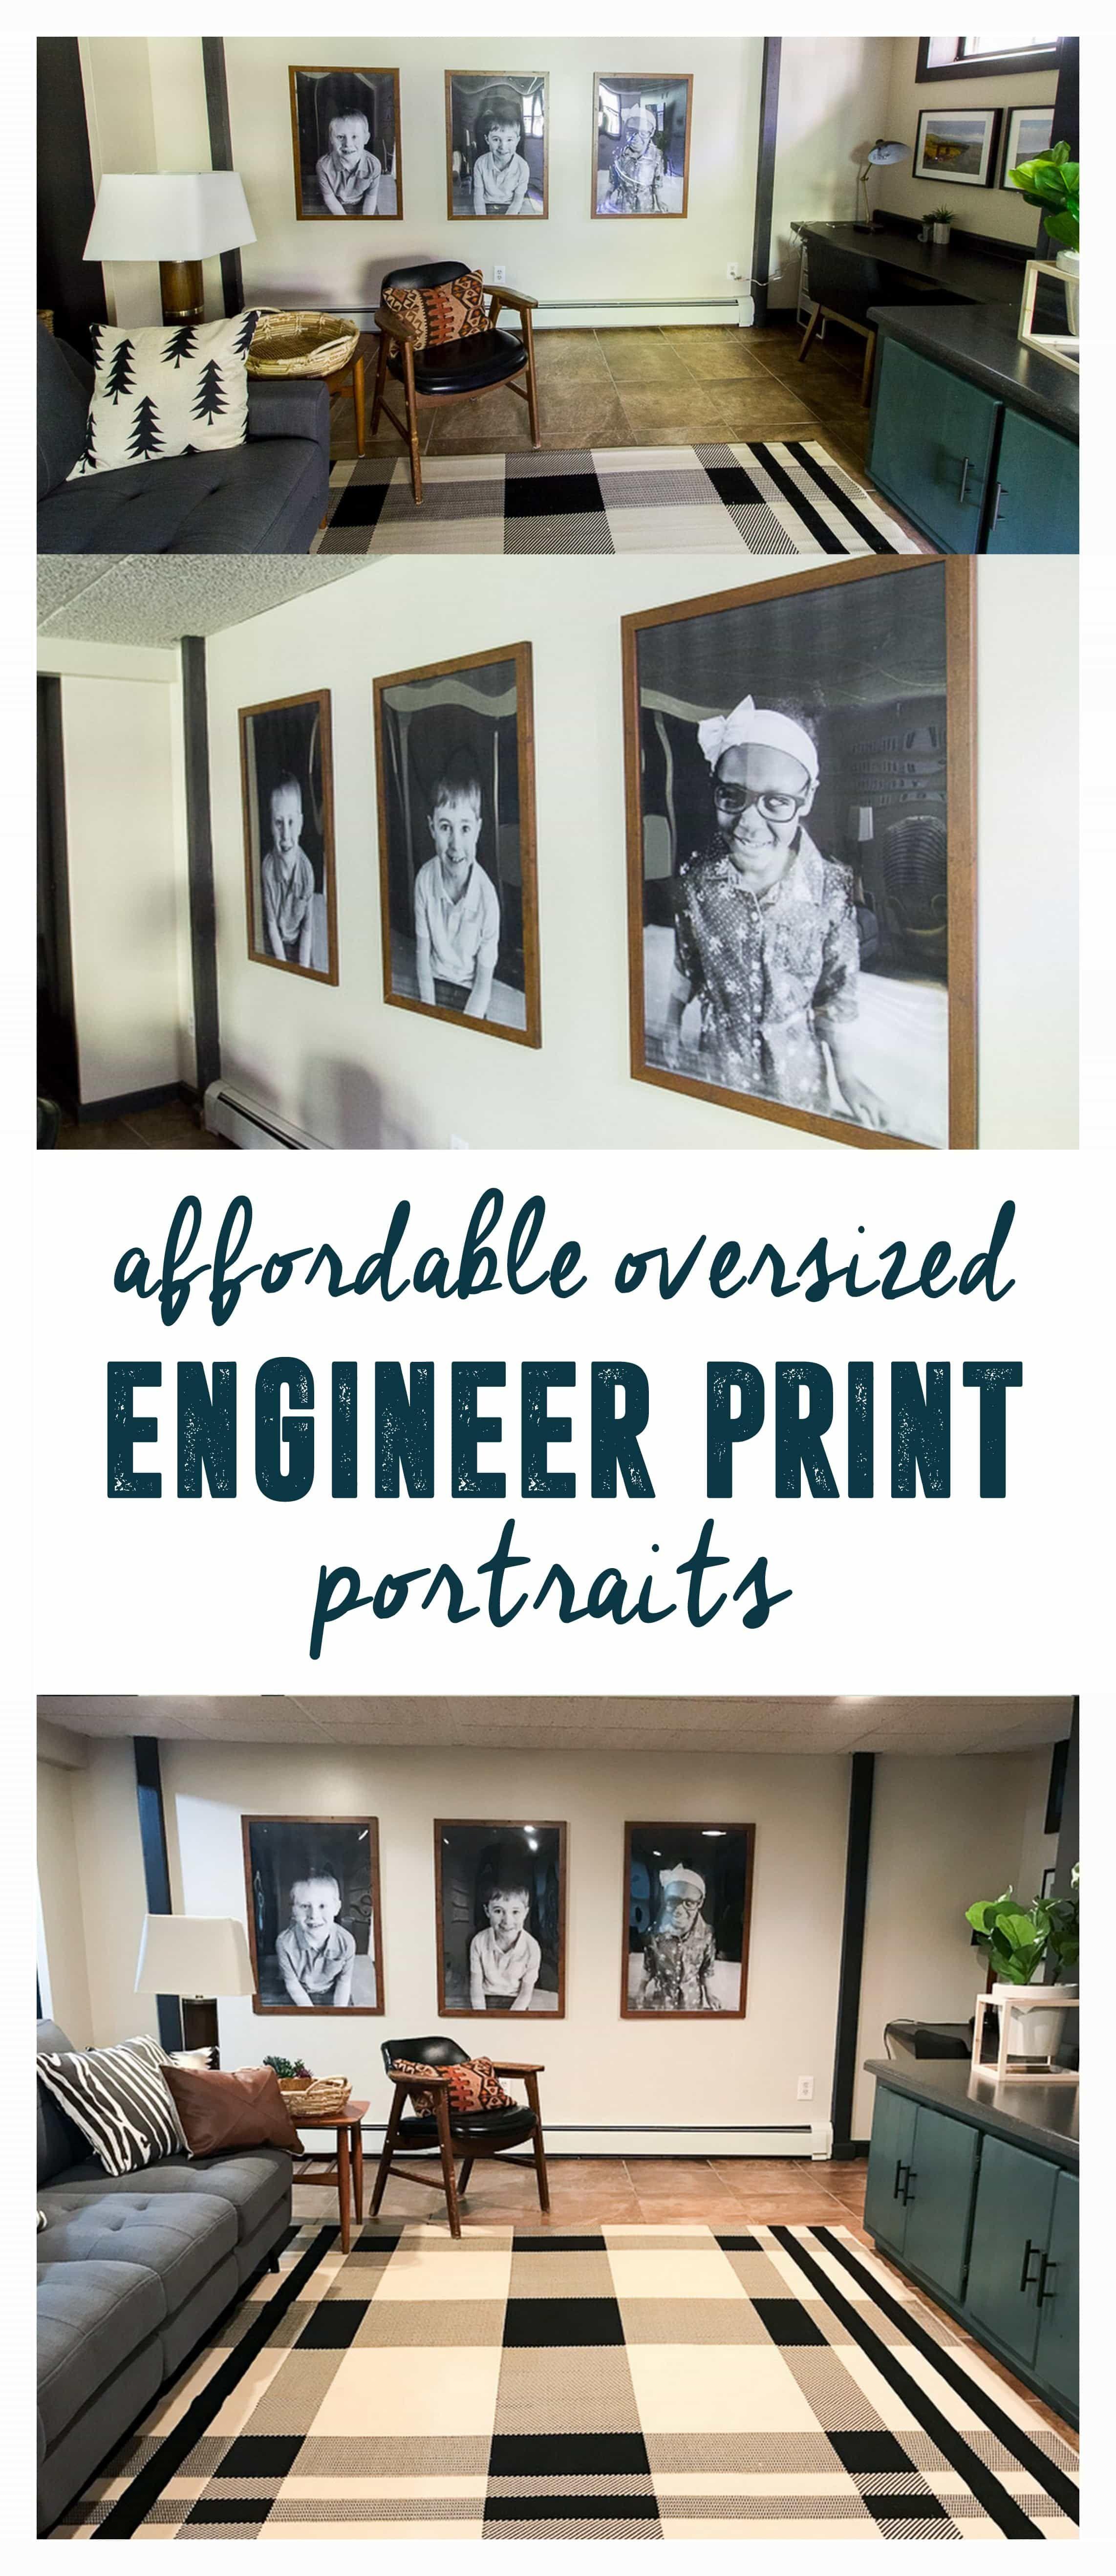 Oversized Engineer Print Portraits Oversized Engineer Print